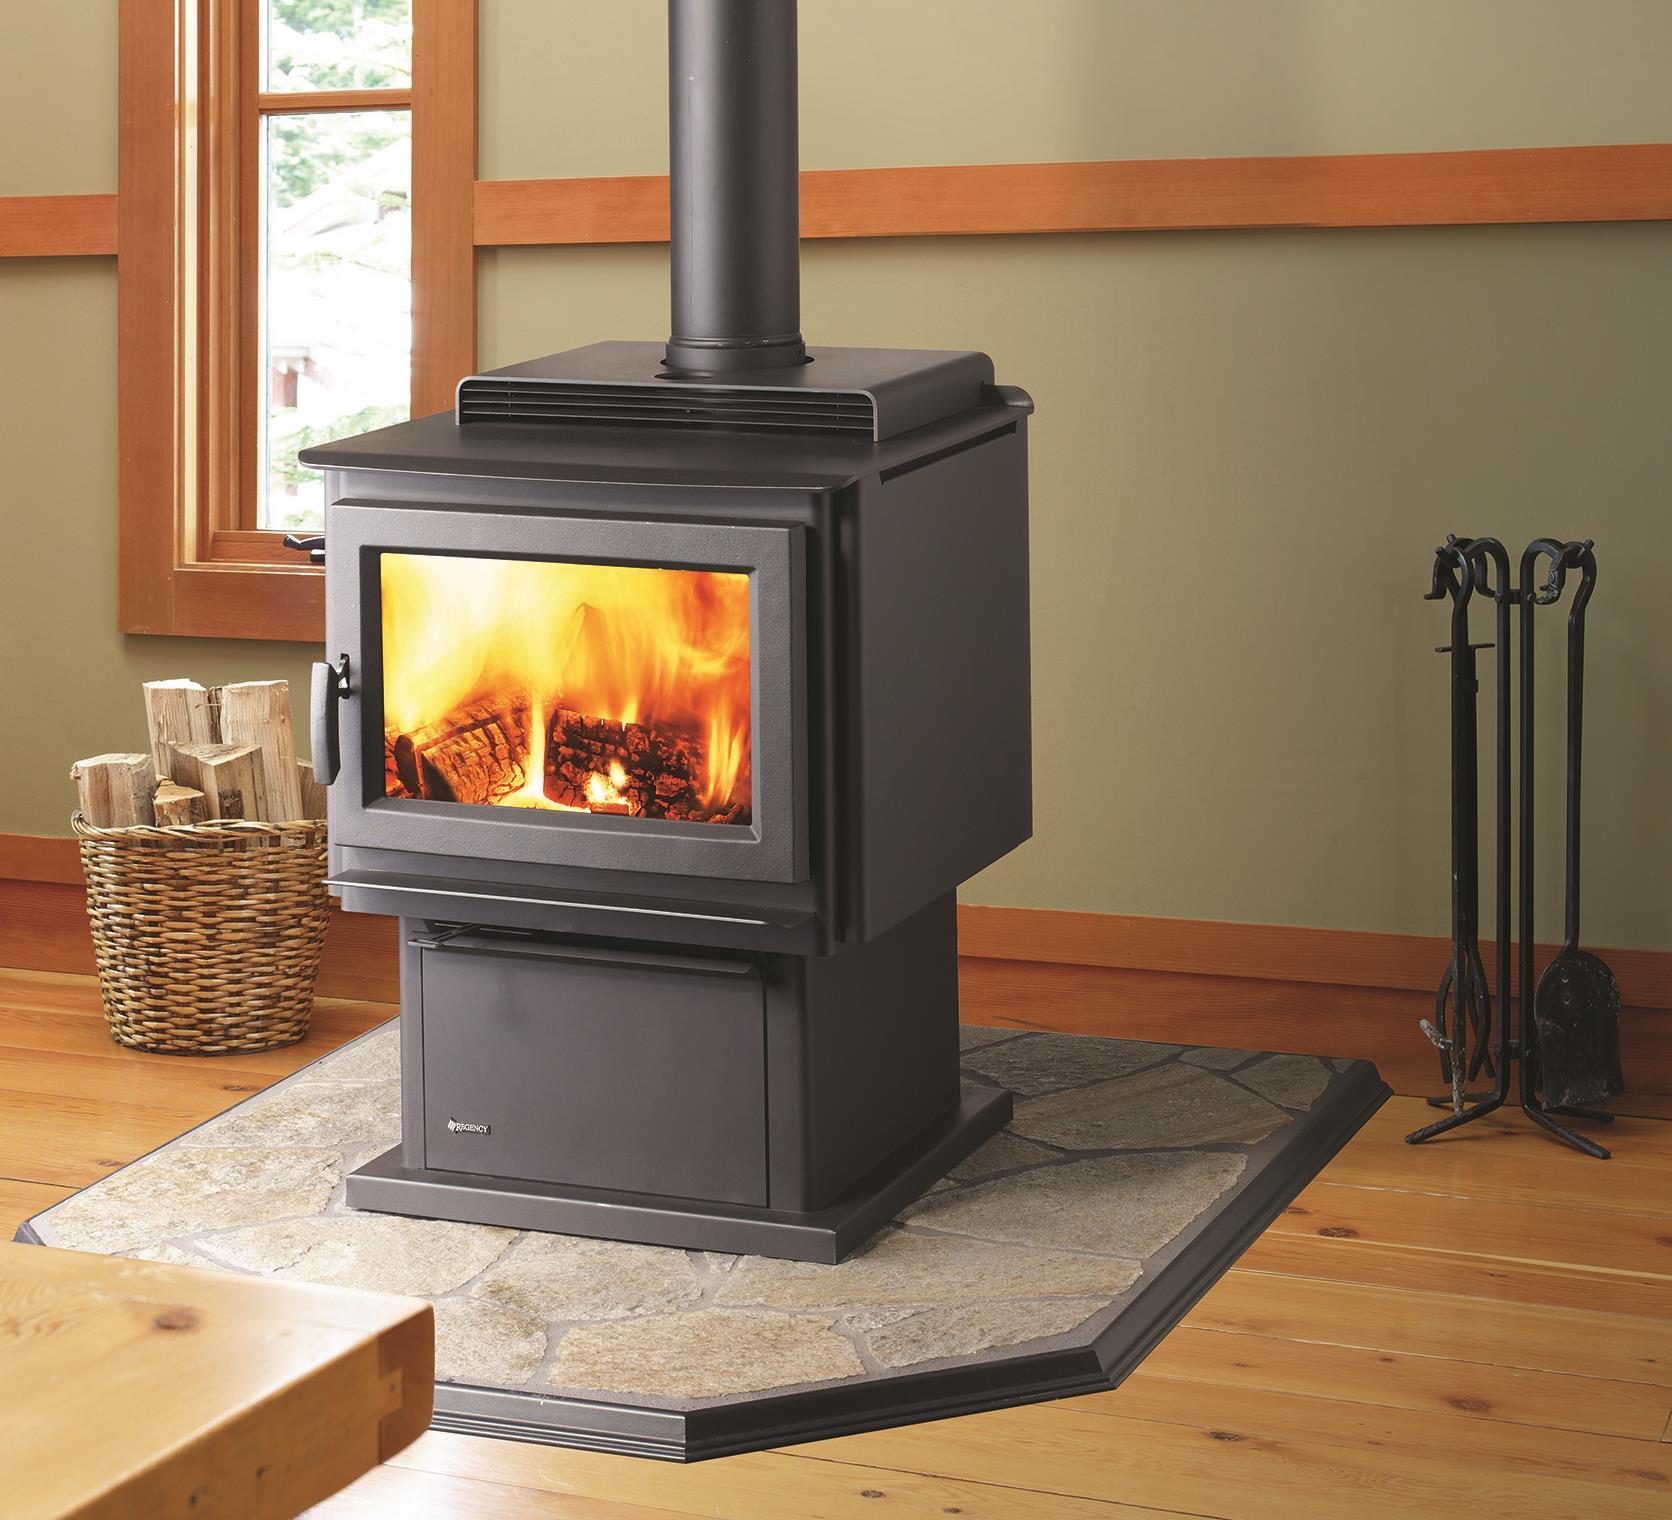 wood stoves pro series f3500 large wood stove kastle fireplace